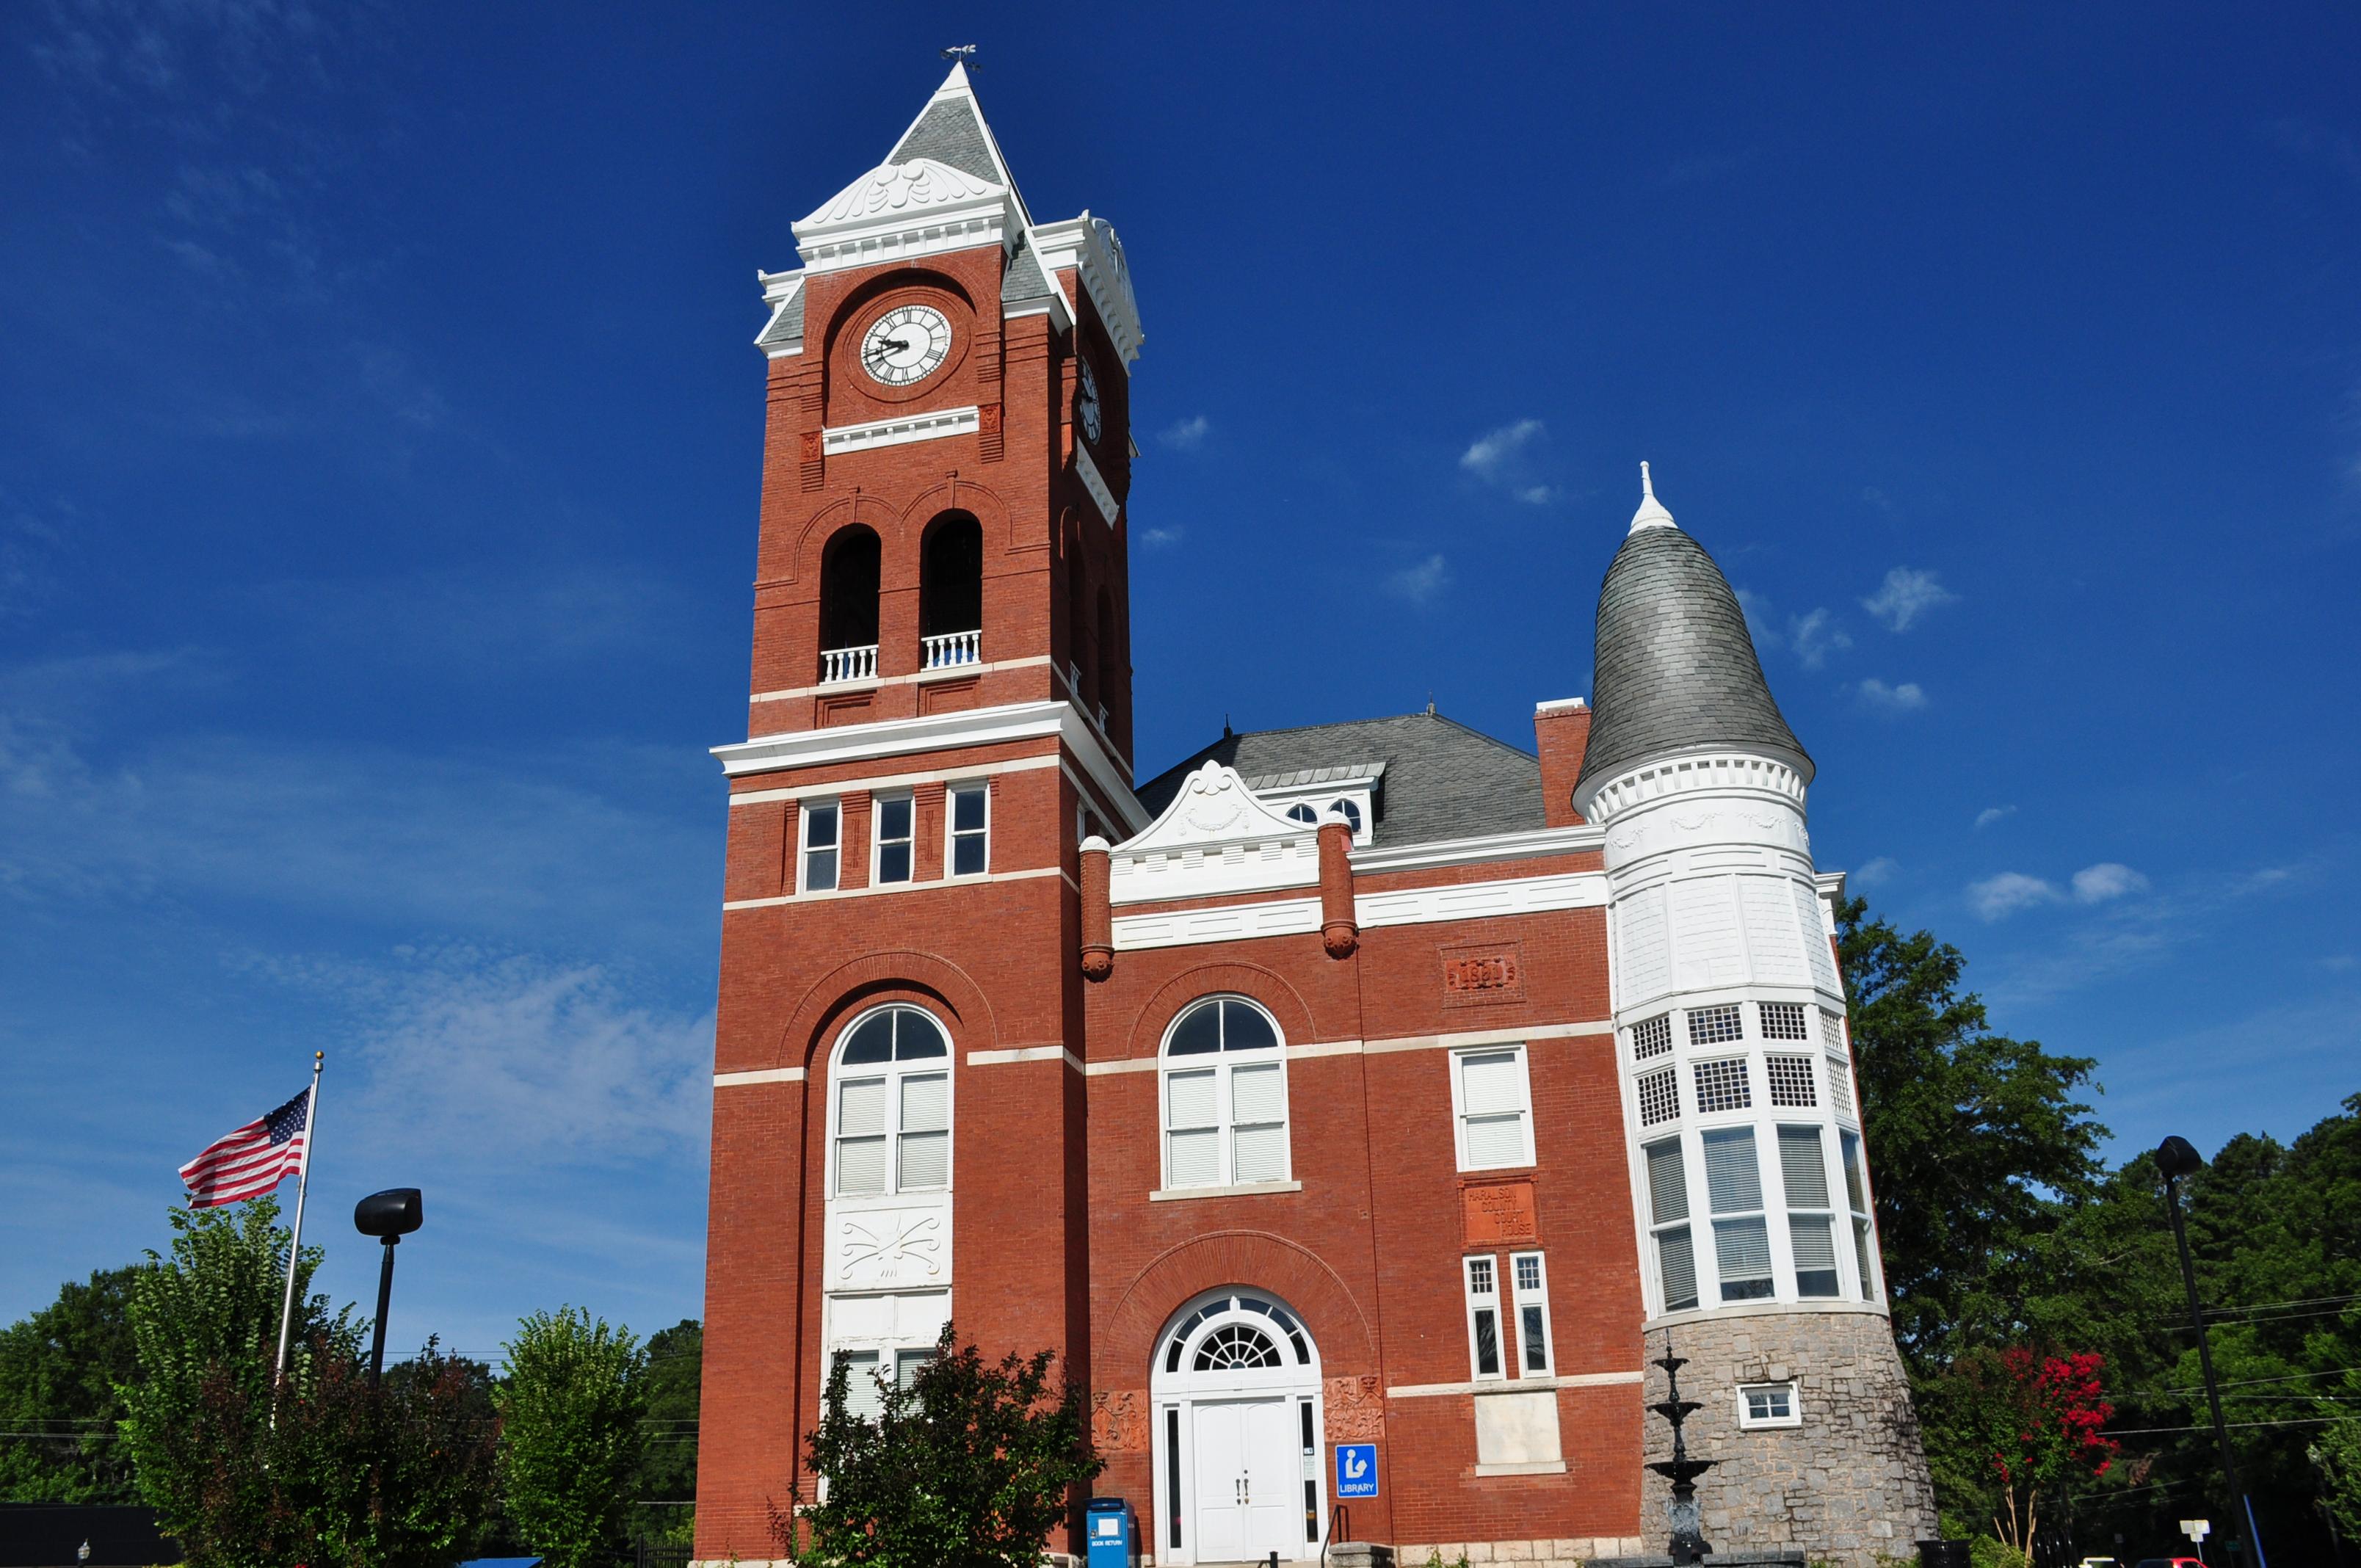 Buchanan Historic Courthousee